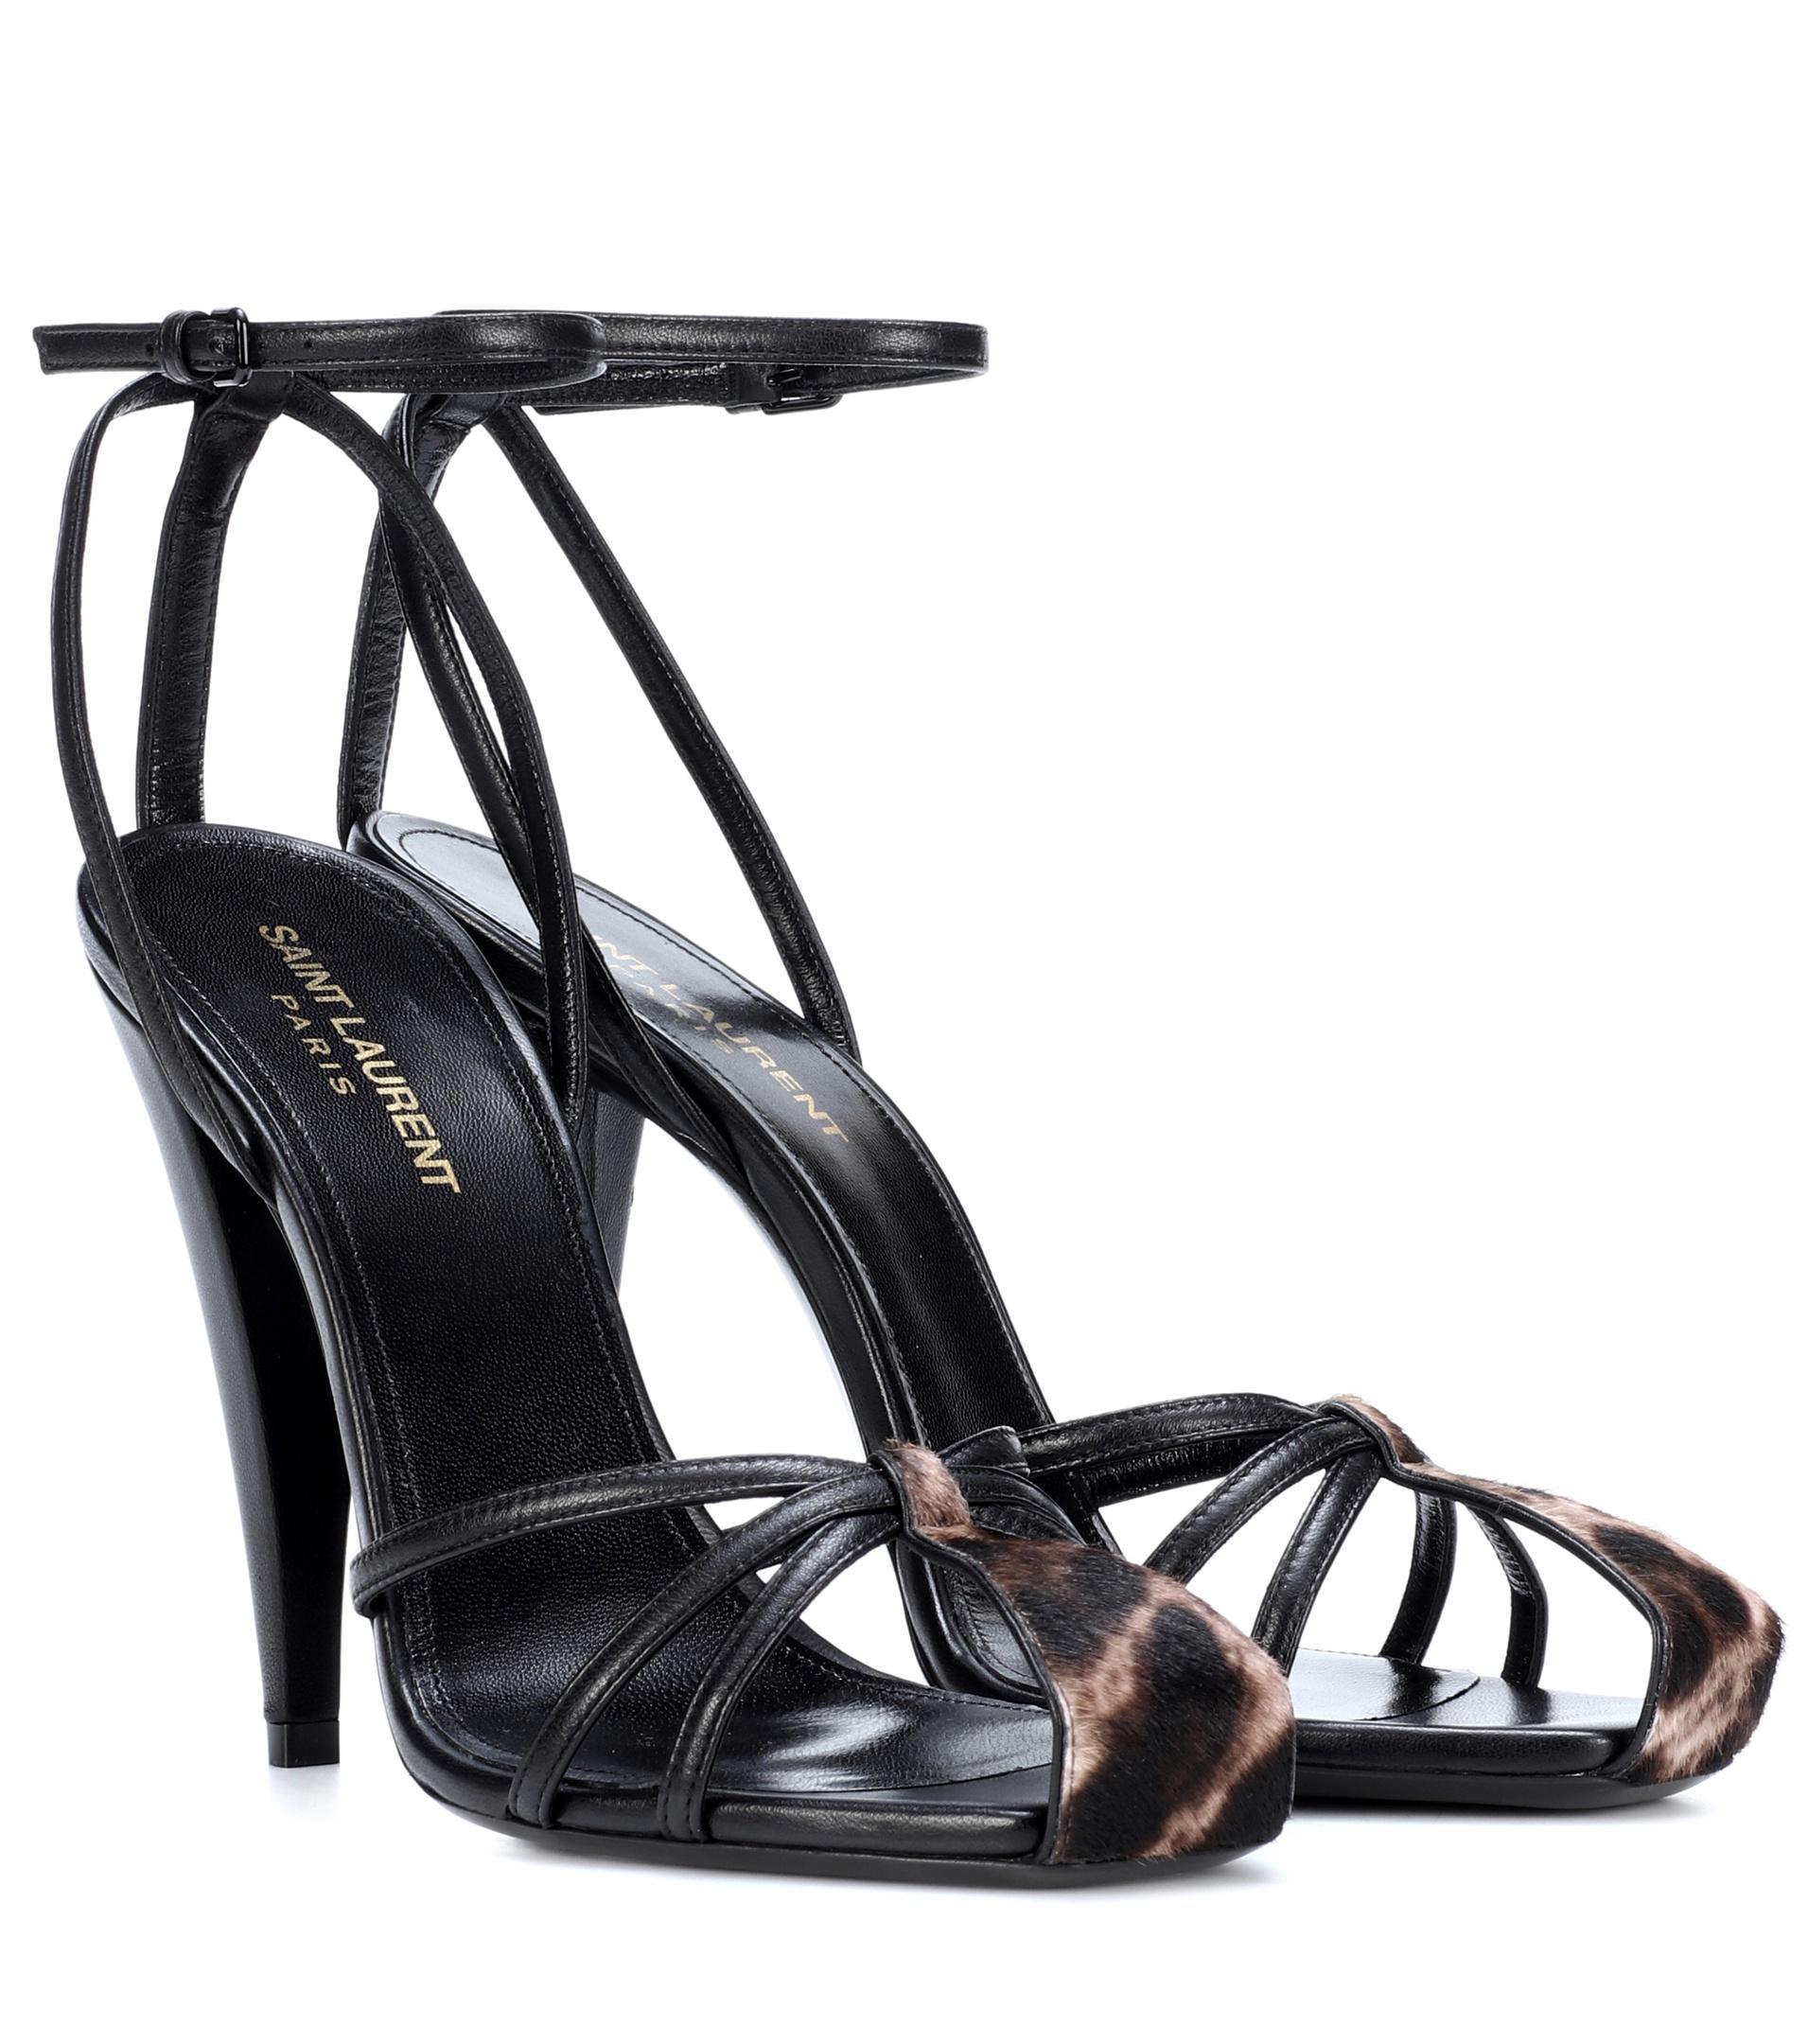 ERA 110 leather sandals Saint Laurent 2rAjxHId